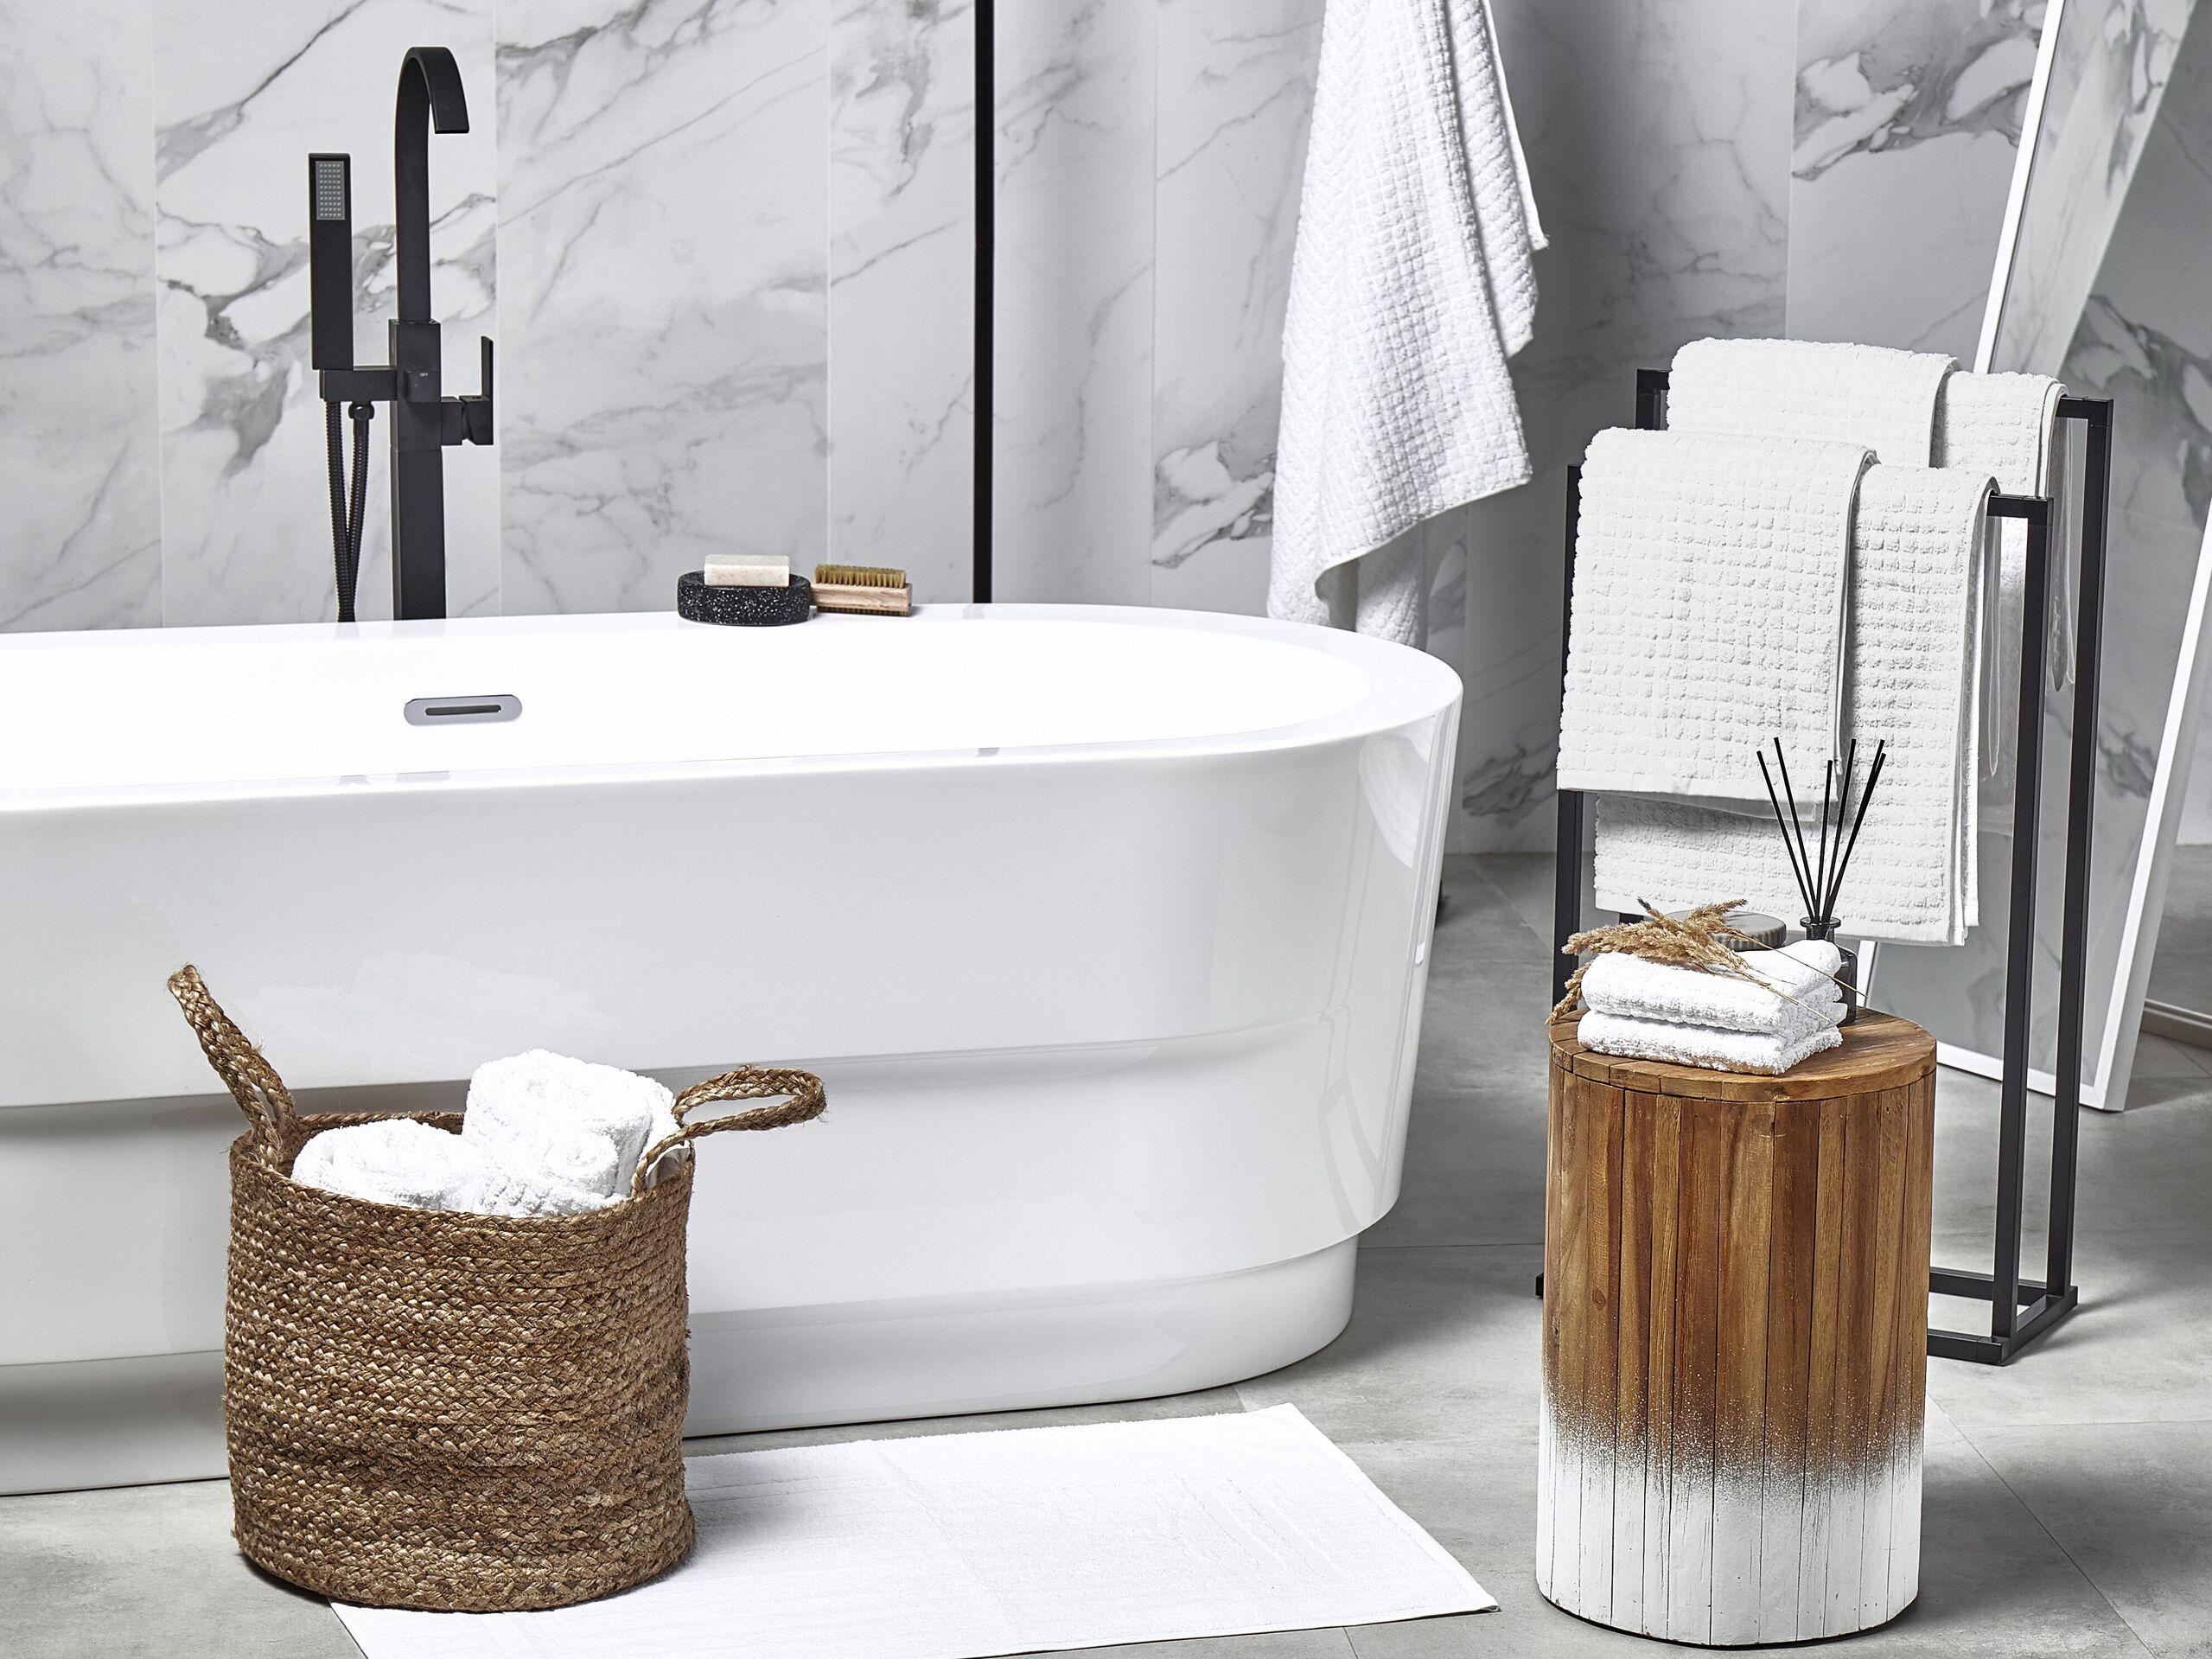 beliani set di 11 asciugamani bianco da bagno in morbido cotone low twist accessori bag